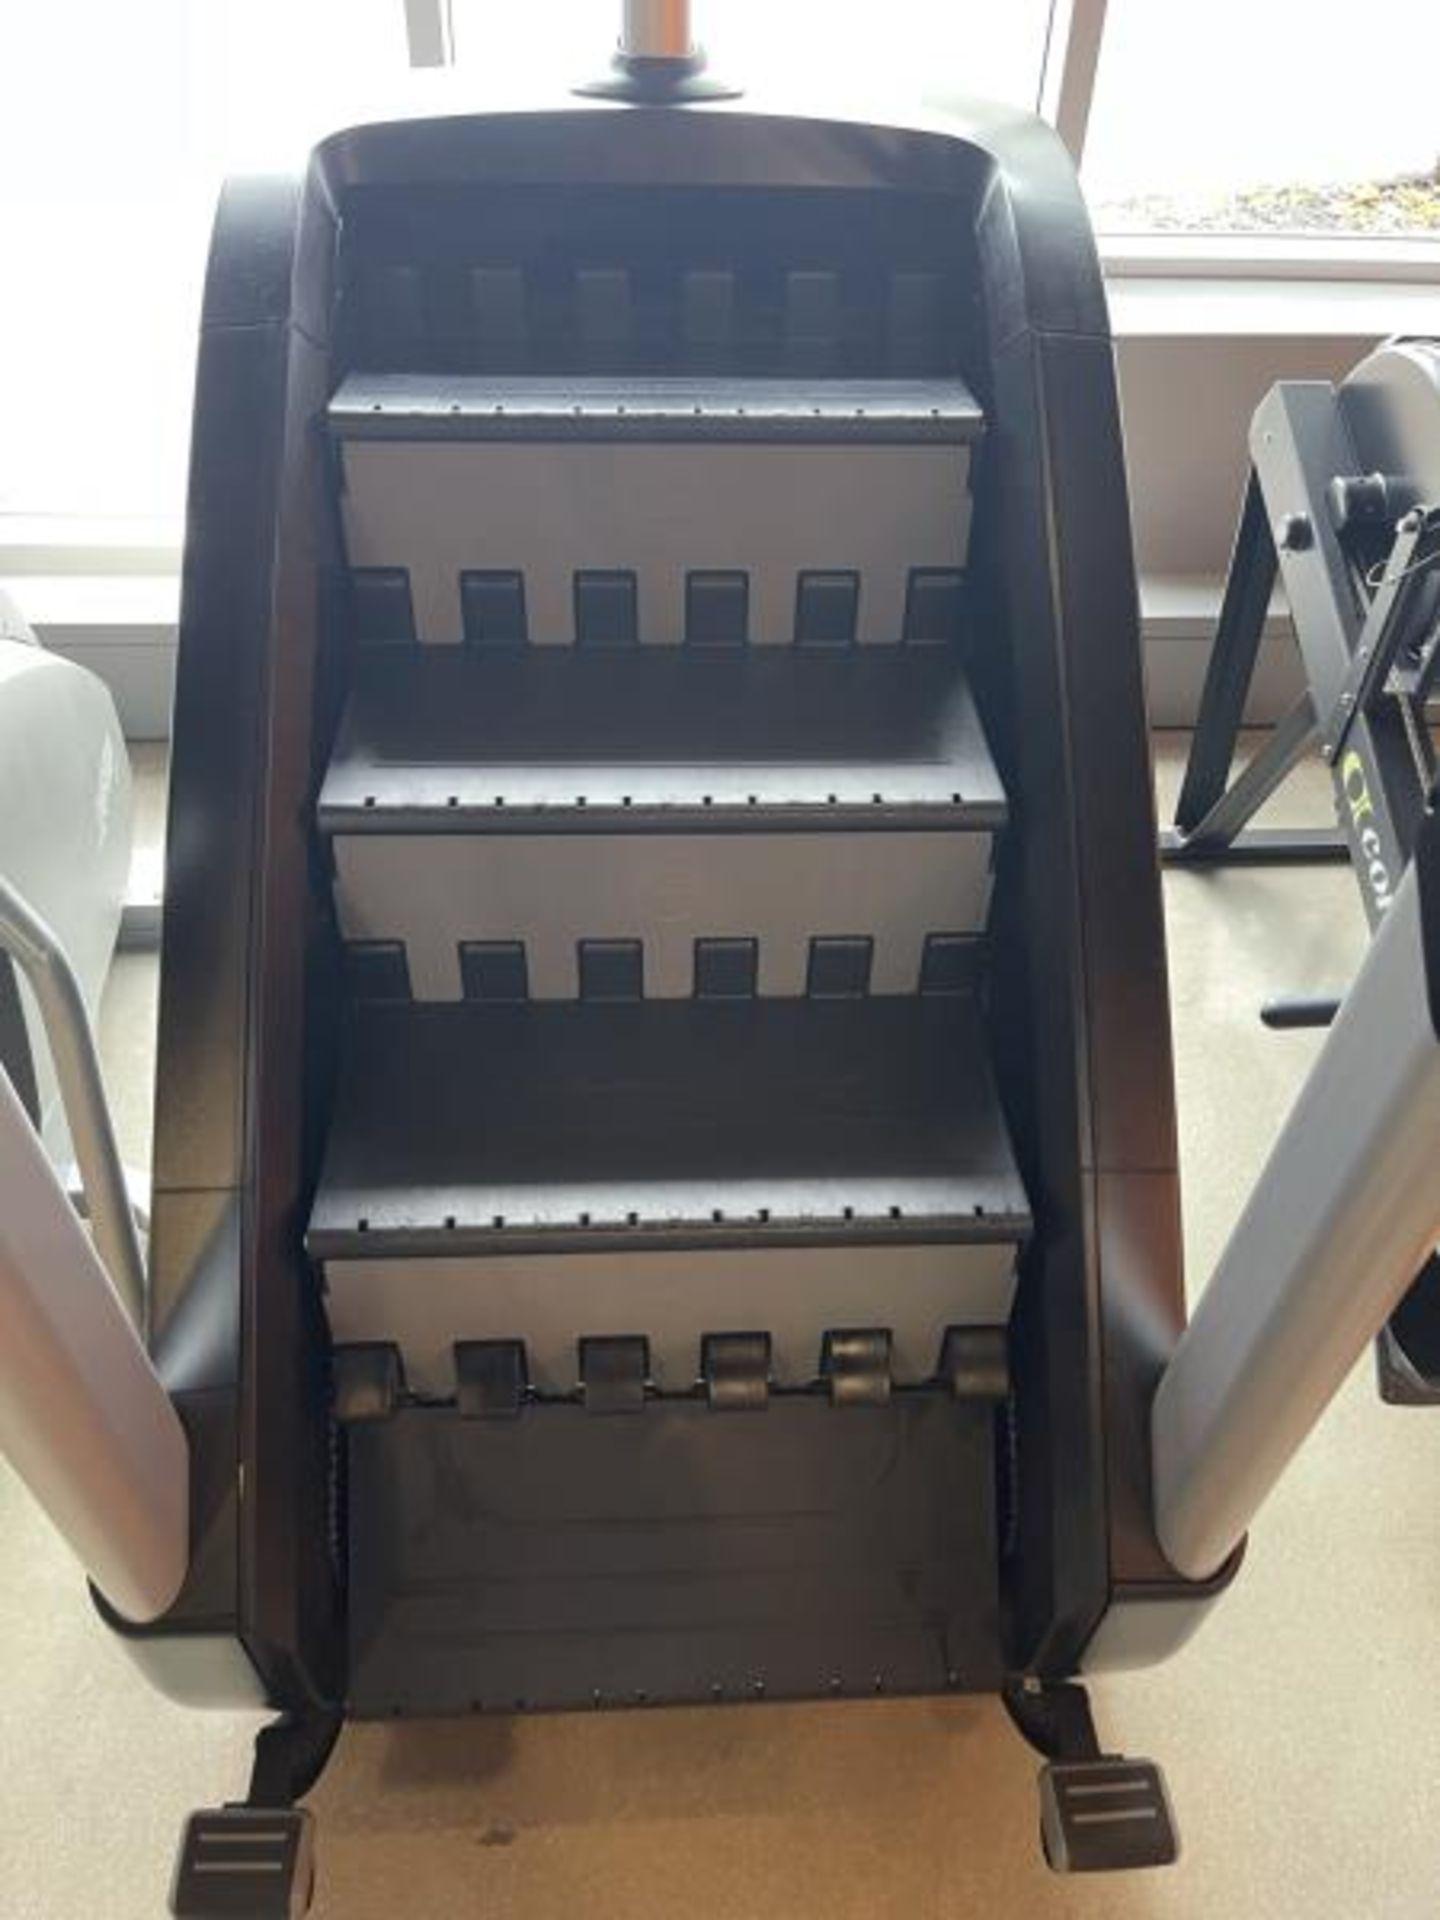 Life Fitness Powermill SN: PMH103963 - Image 2 of 7